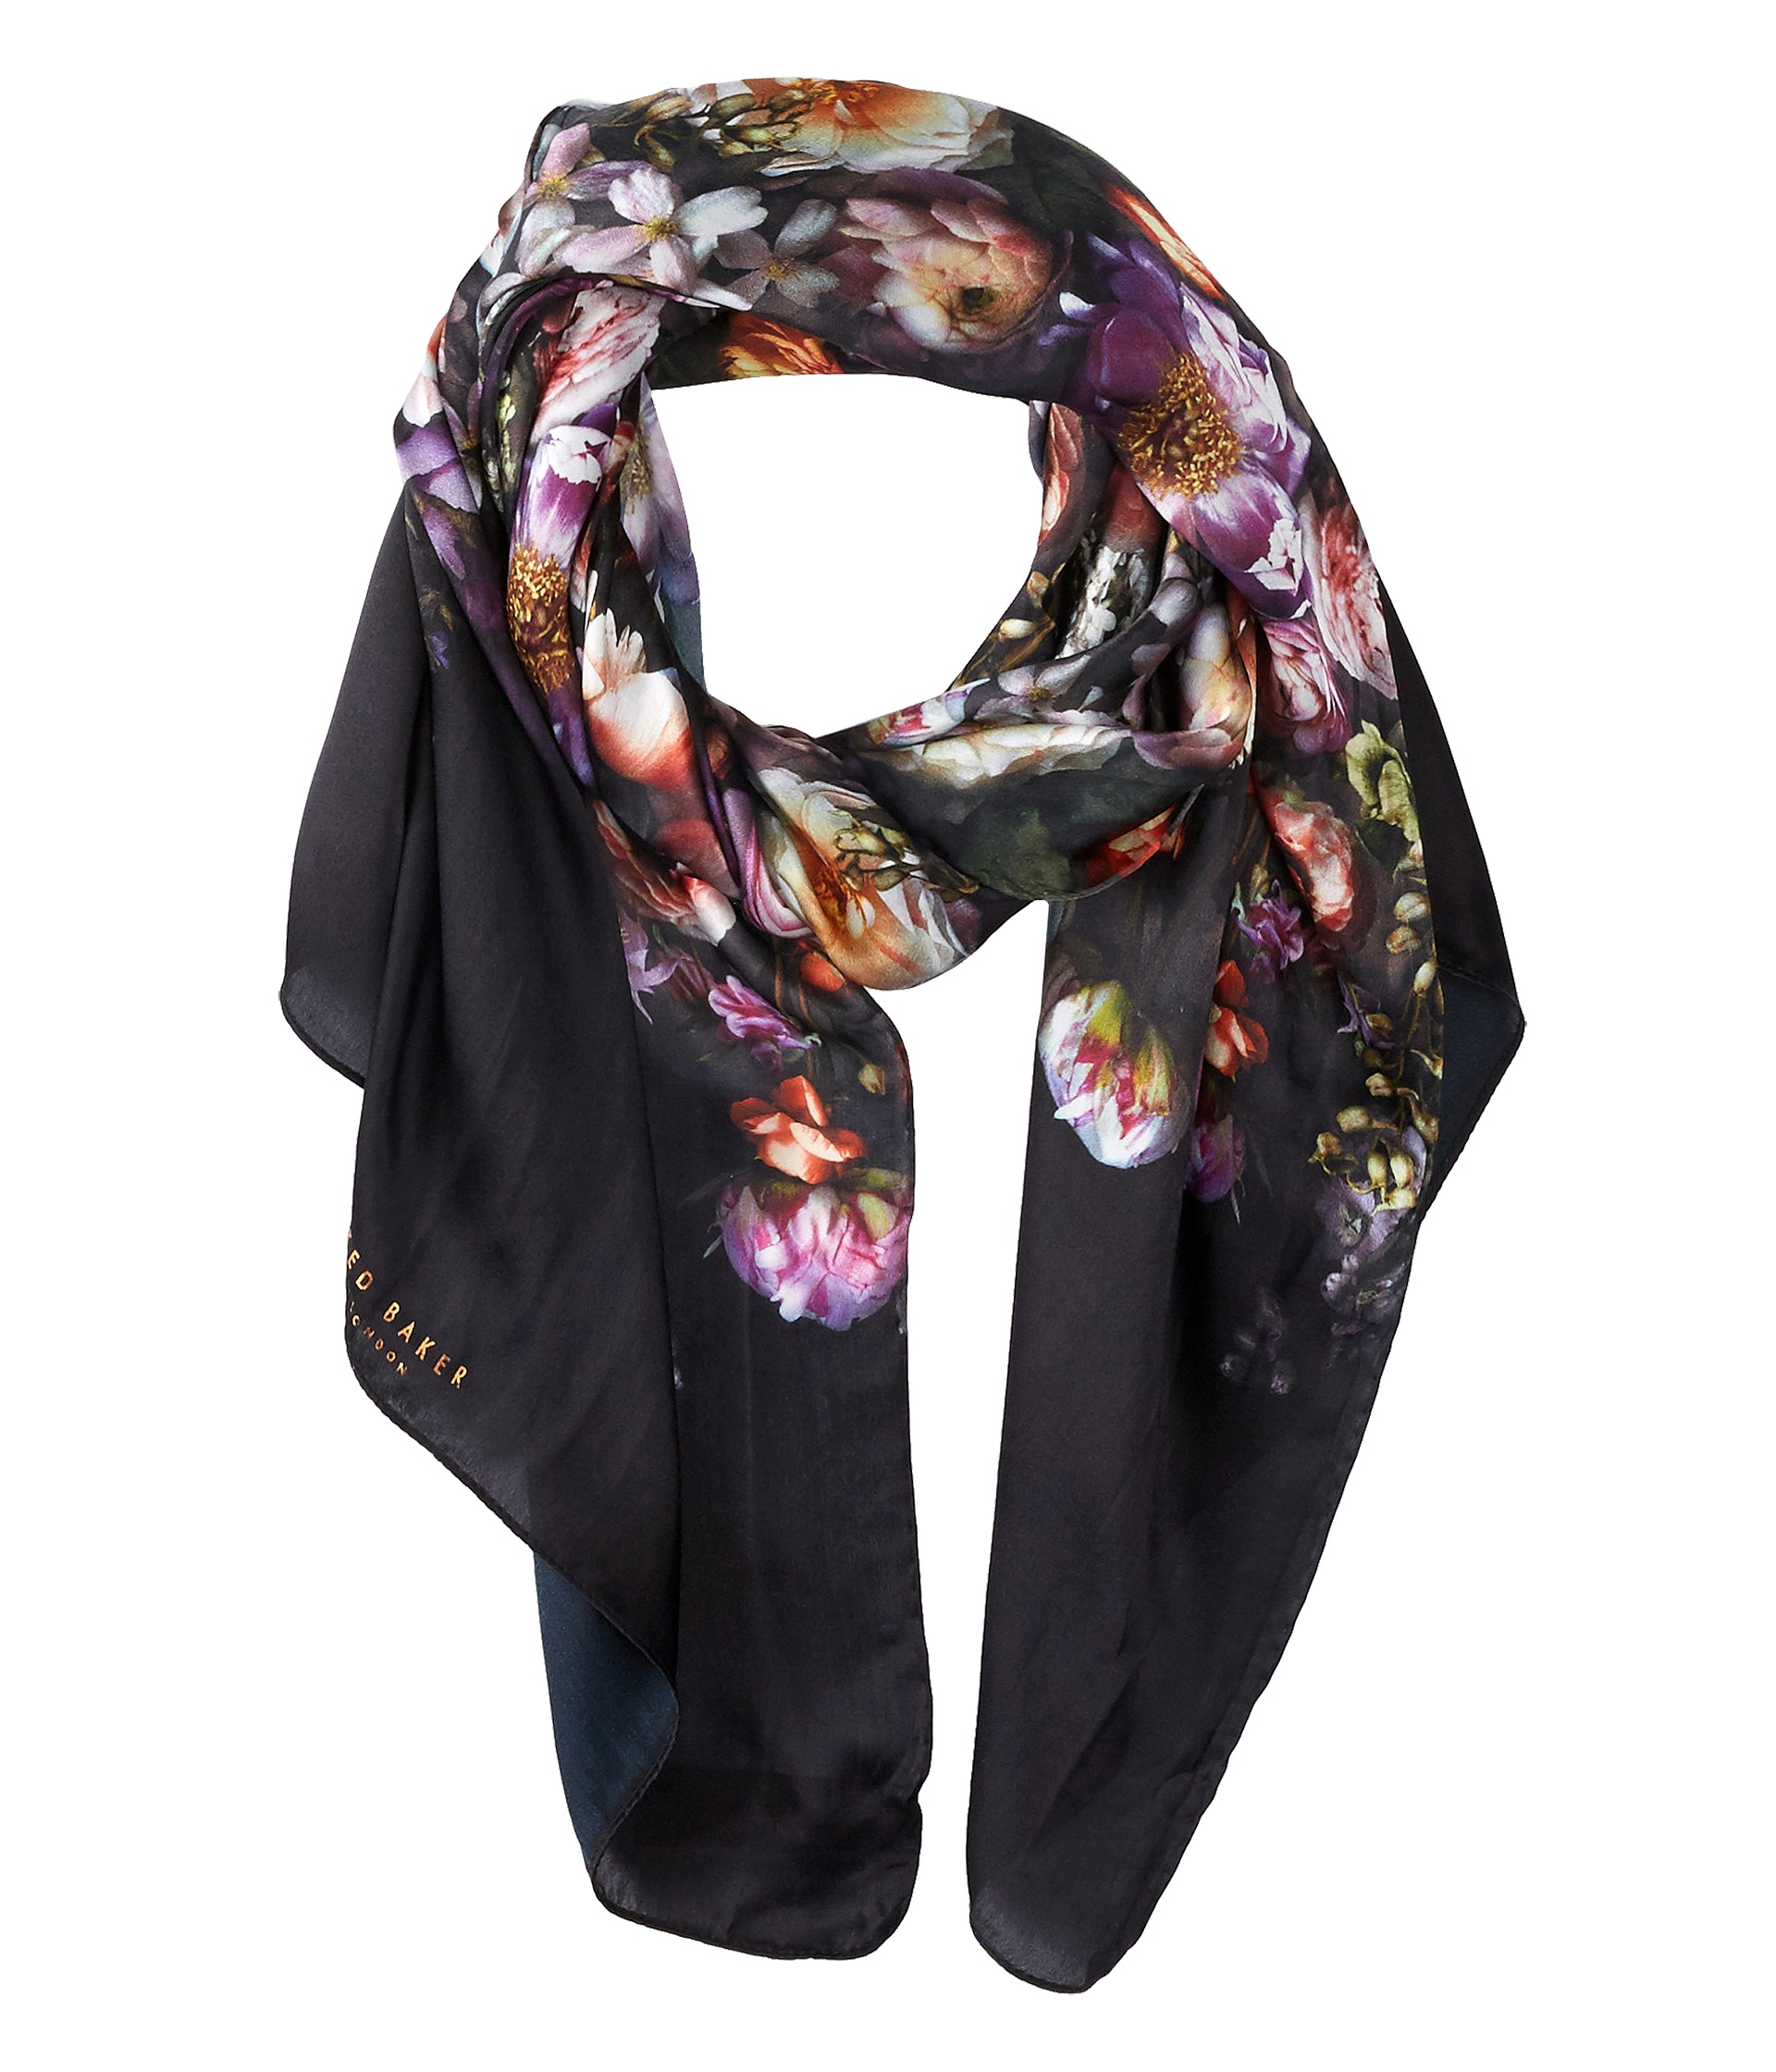 b99b816a5ce84 Ted Baker Shadow Floral Long Silk Scarf Lyst